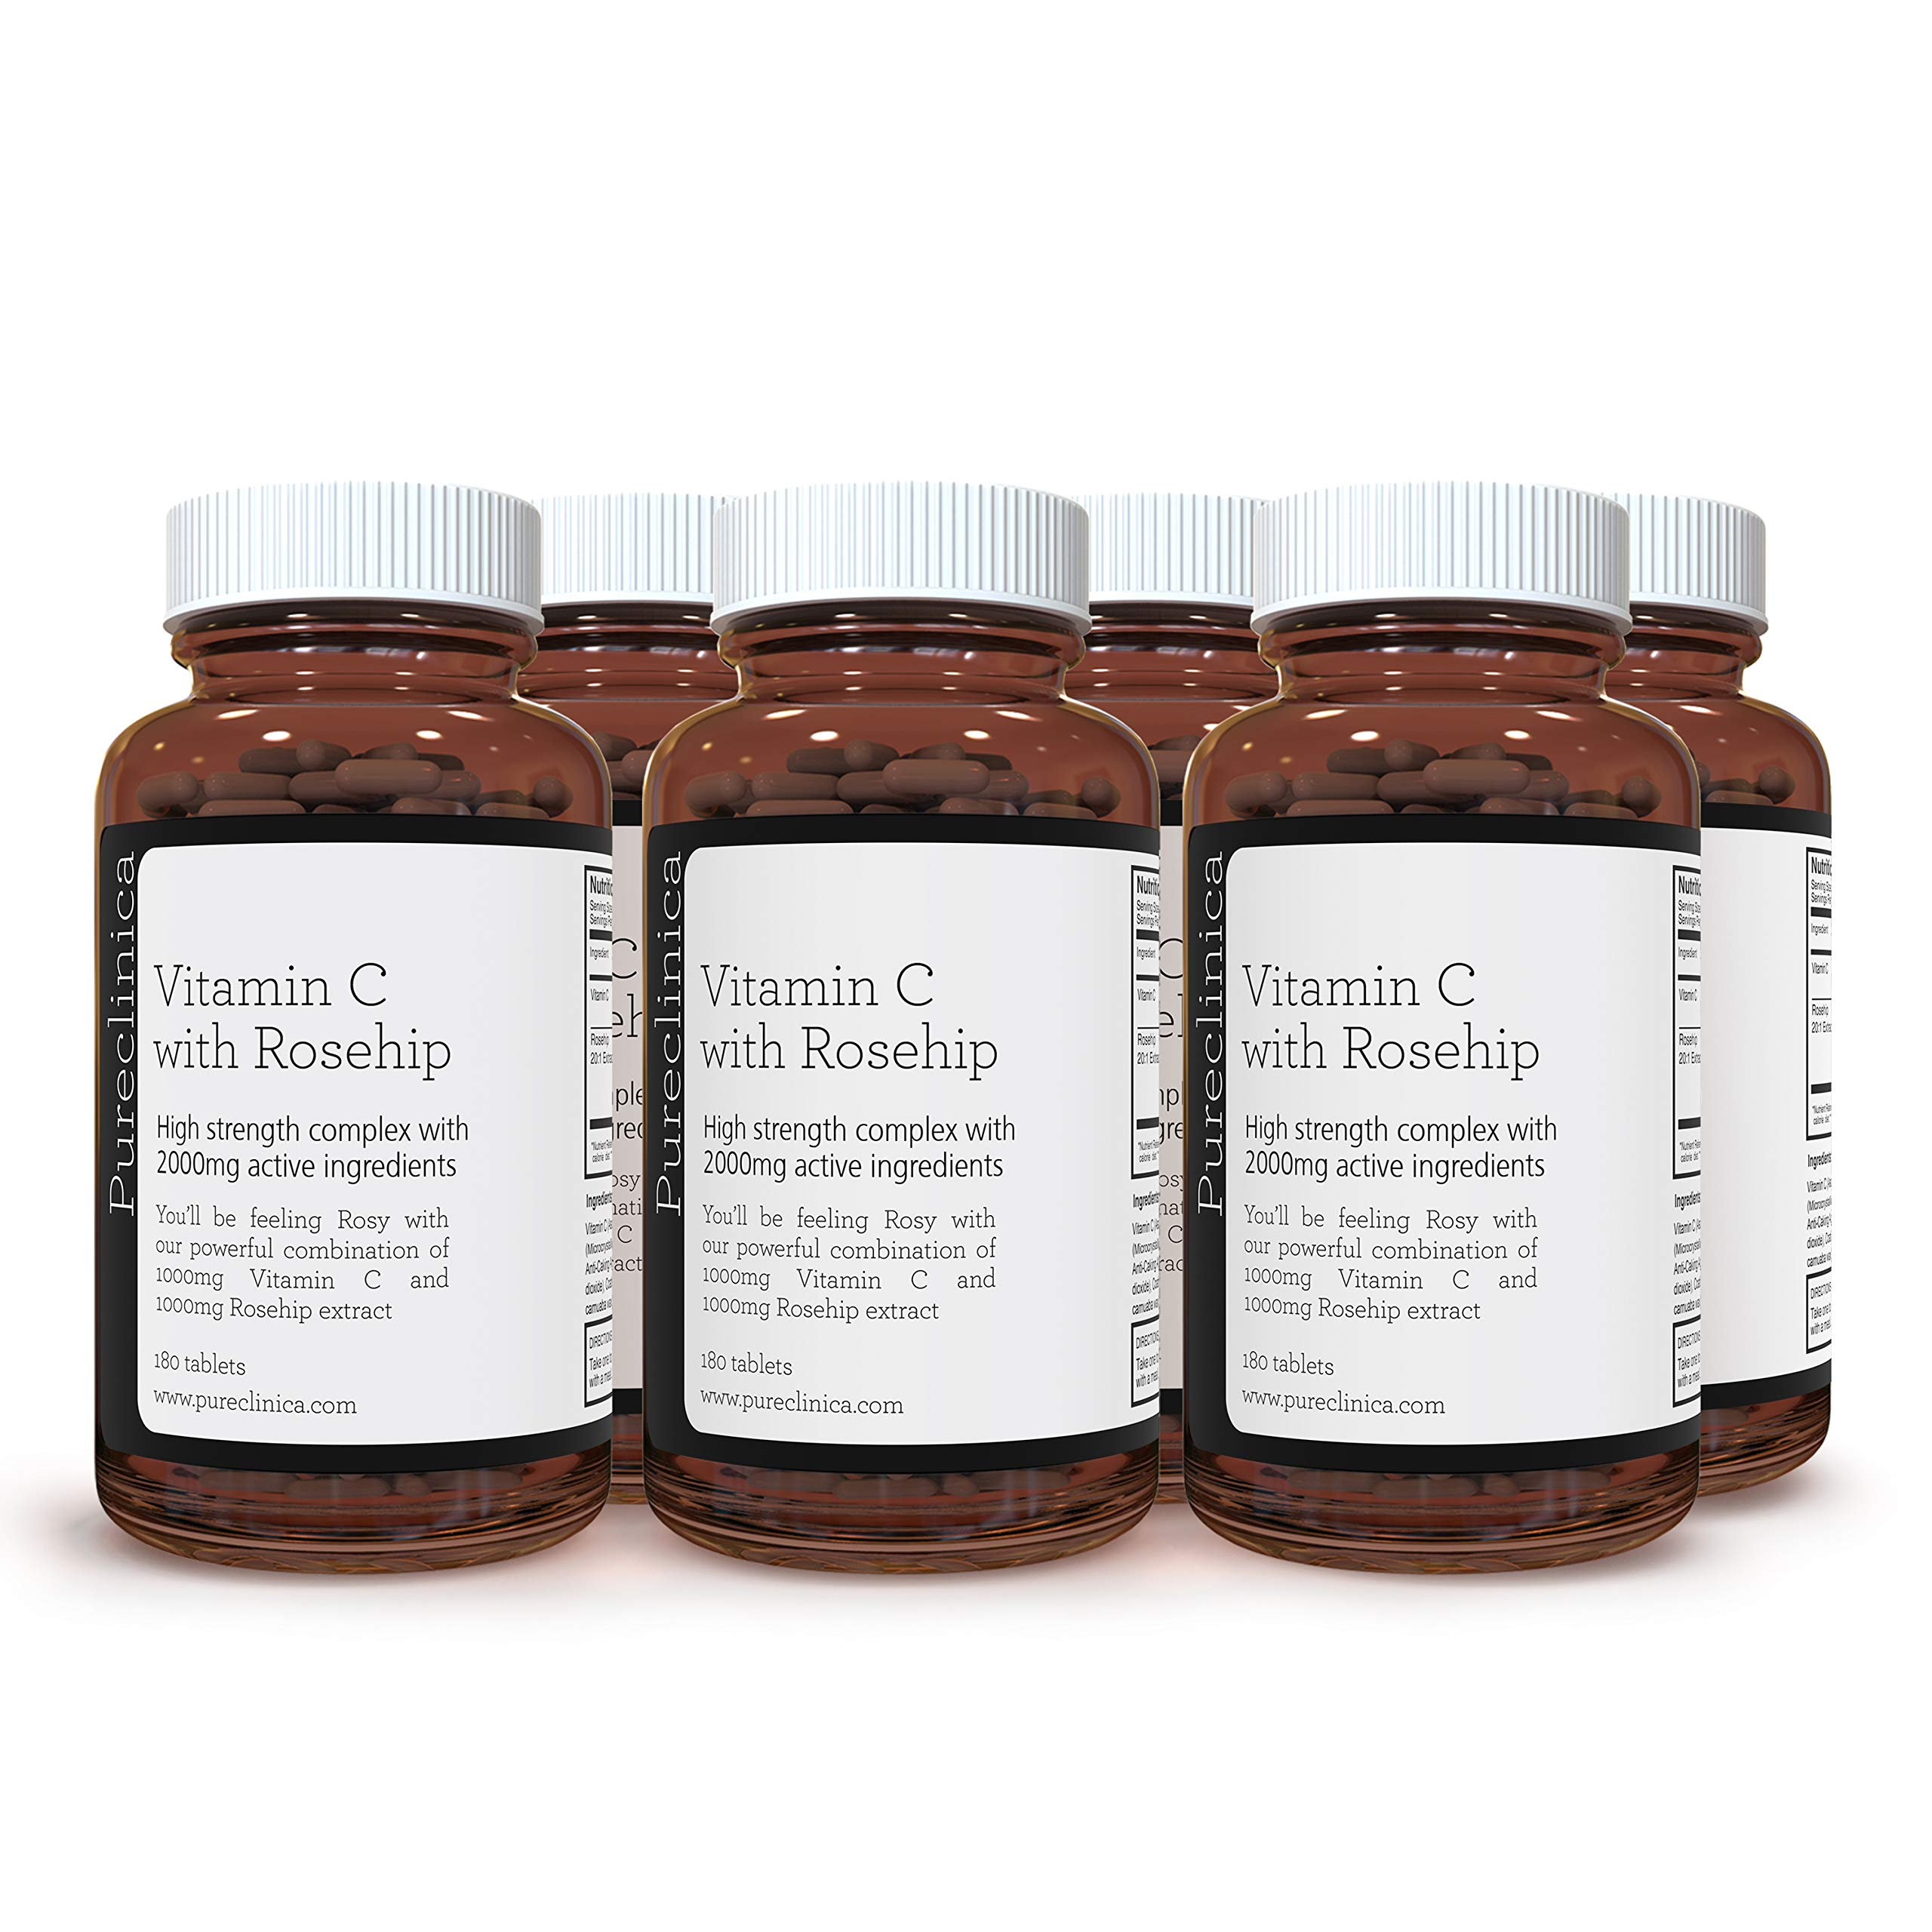 Vitamin C with Rosehip – 2000mg (1000mg VIT C & 1000mg Rosehip Extract) x 1080 Tablets – 3 Years Supply! SKU: ROSEC3x6